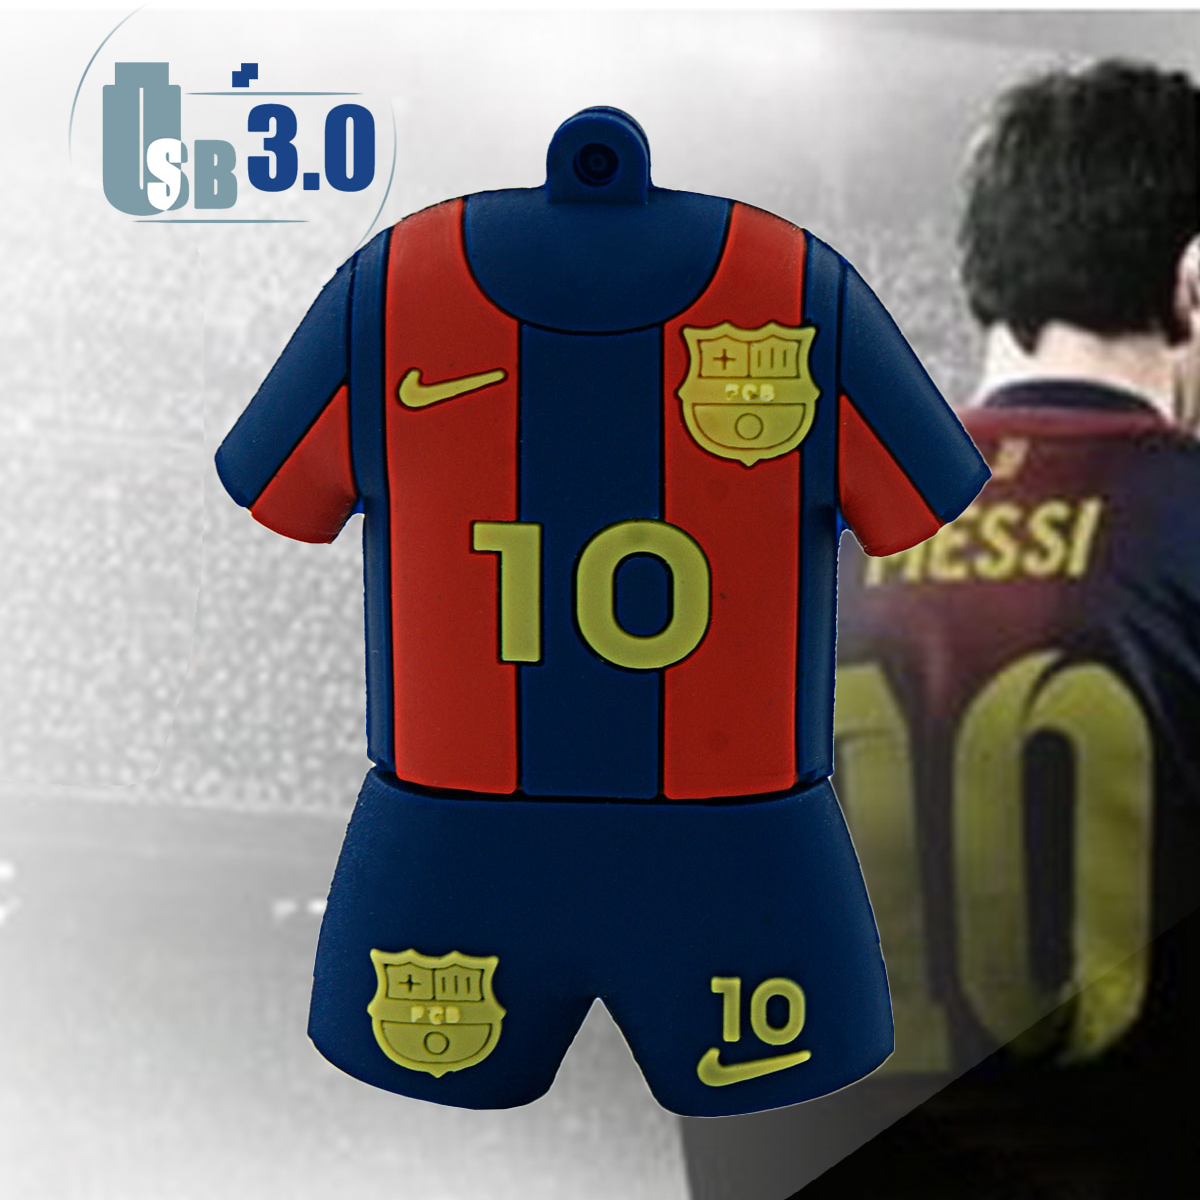 Cartoon Barcelona Soccer Jersey Meissi Pen Drive 8GB 16GB 32GB 64GB maillot de foot barcelone USB3.0 Flash Drive USB Key VEHOOT(China (Mainland))